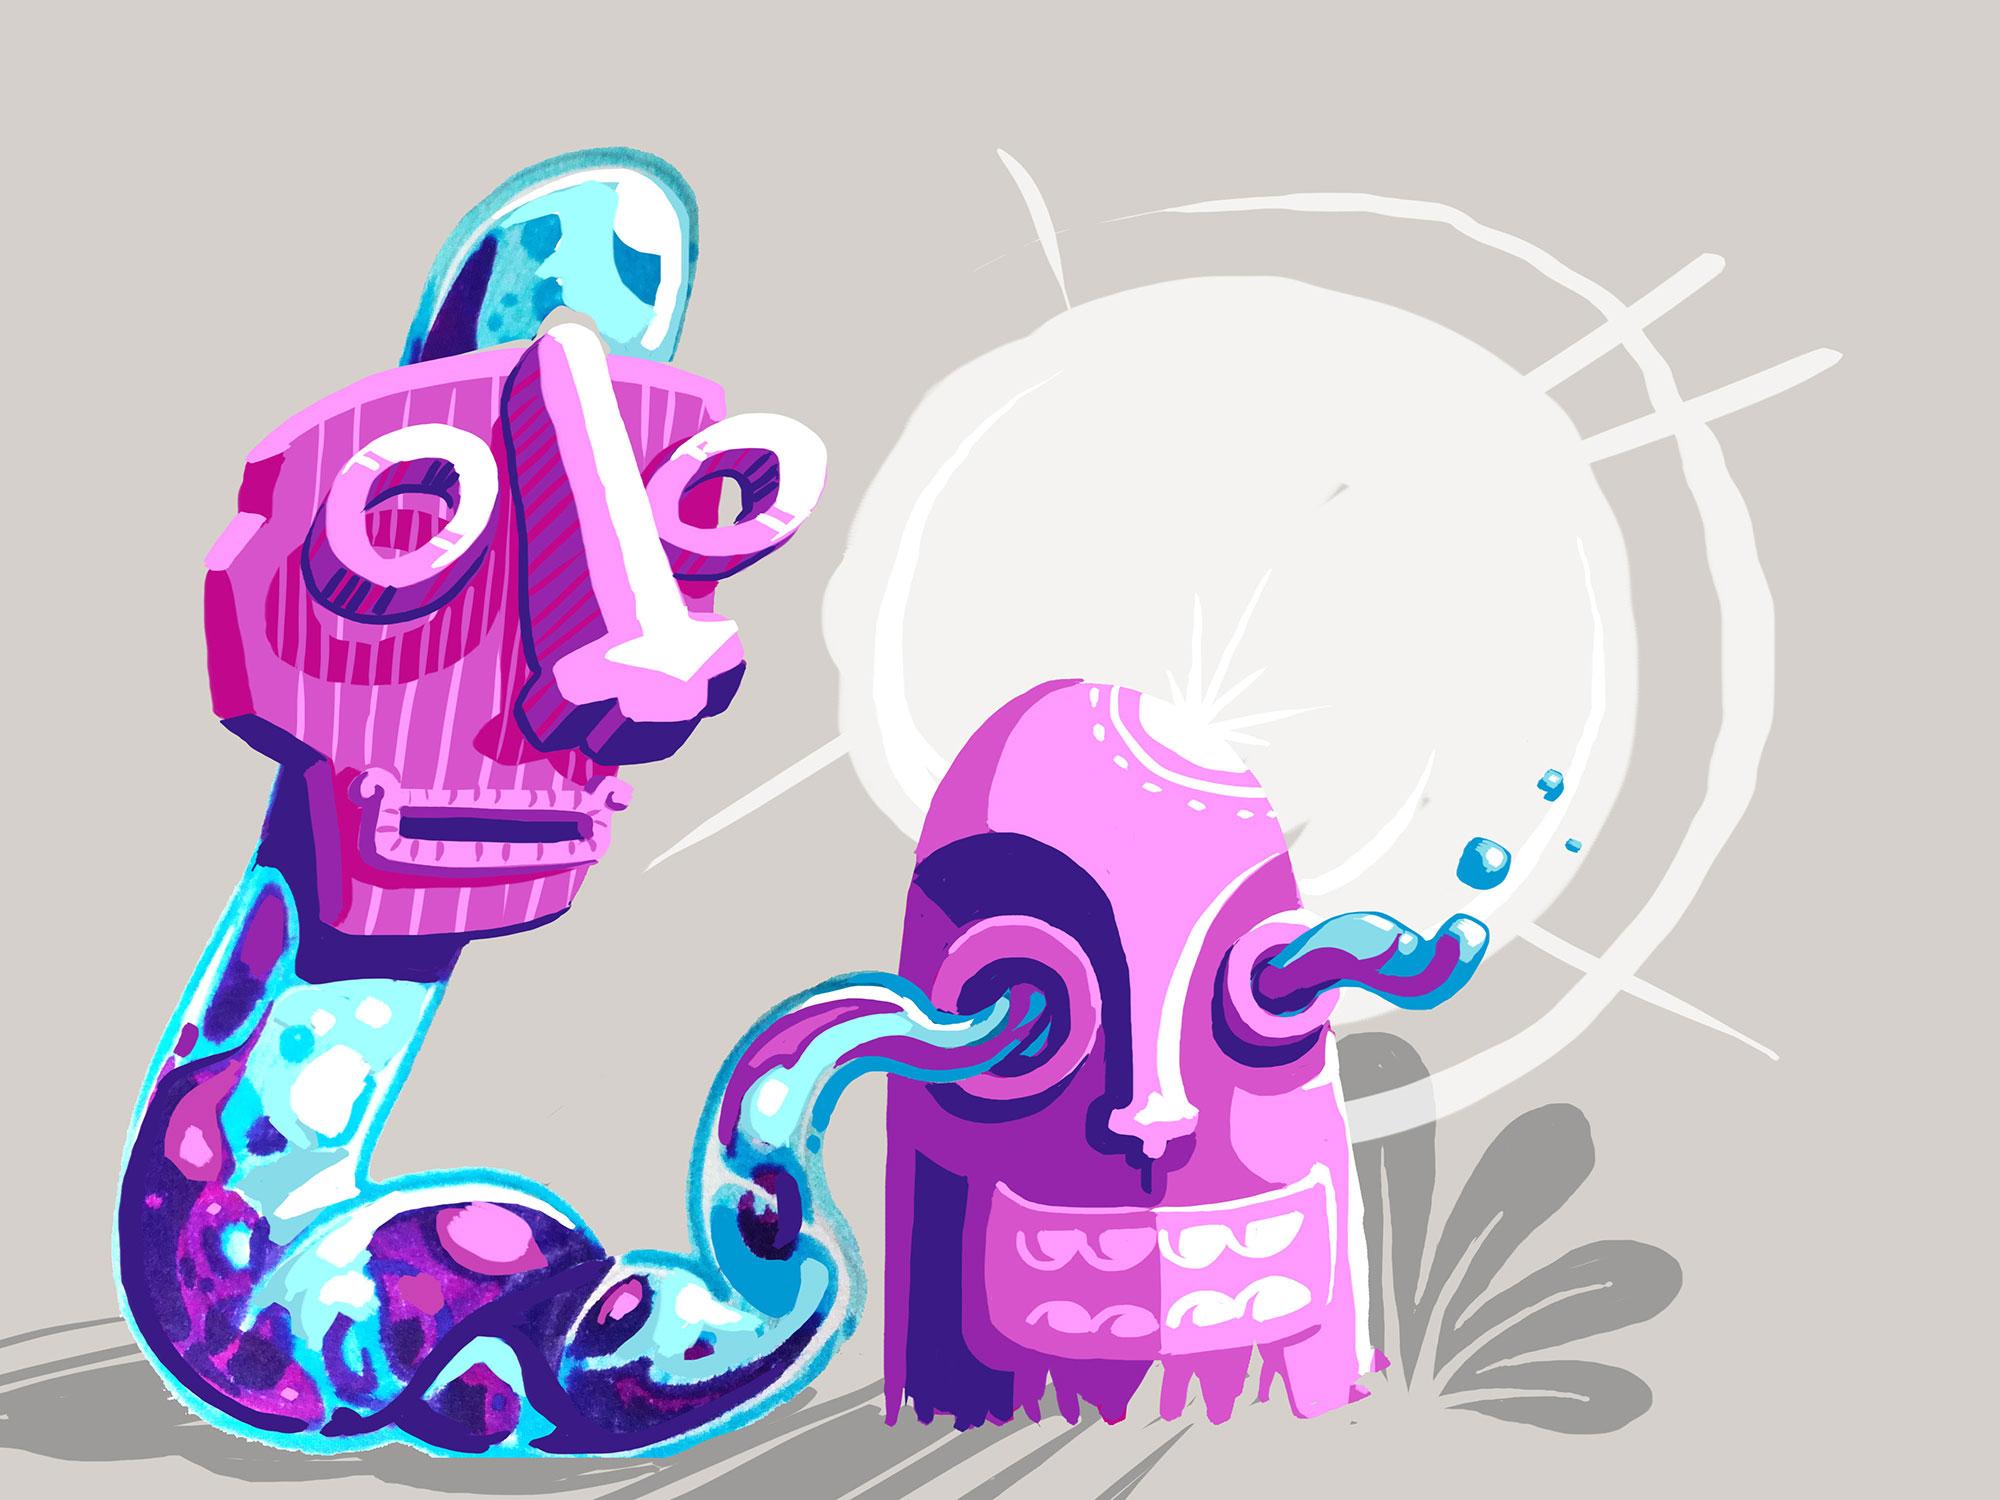 abys illustrateur - graphiste - da lyon - concept-art tribal vegetal @peinturefraichefestival - peinture fraiche festival